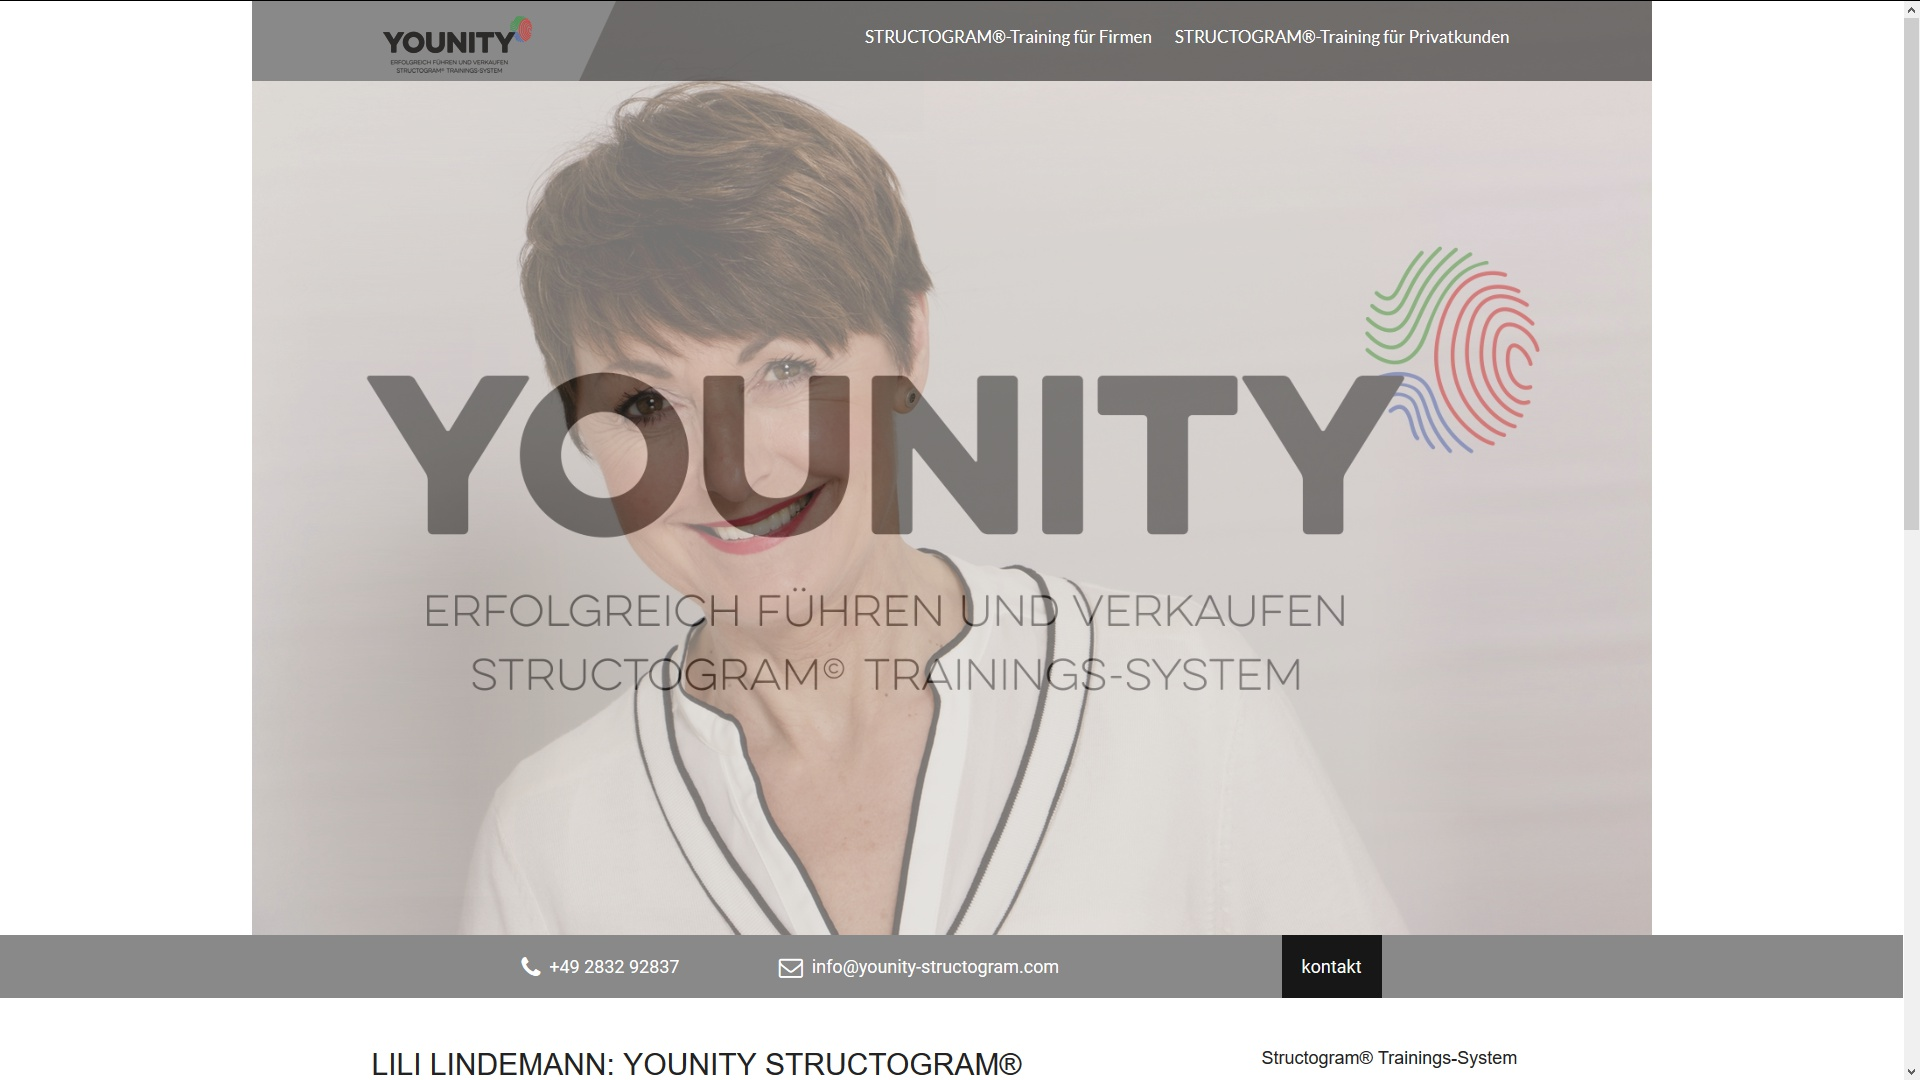 www.younity-structogram.com